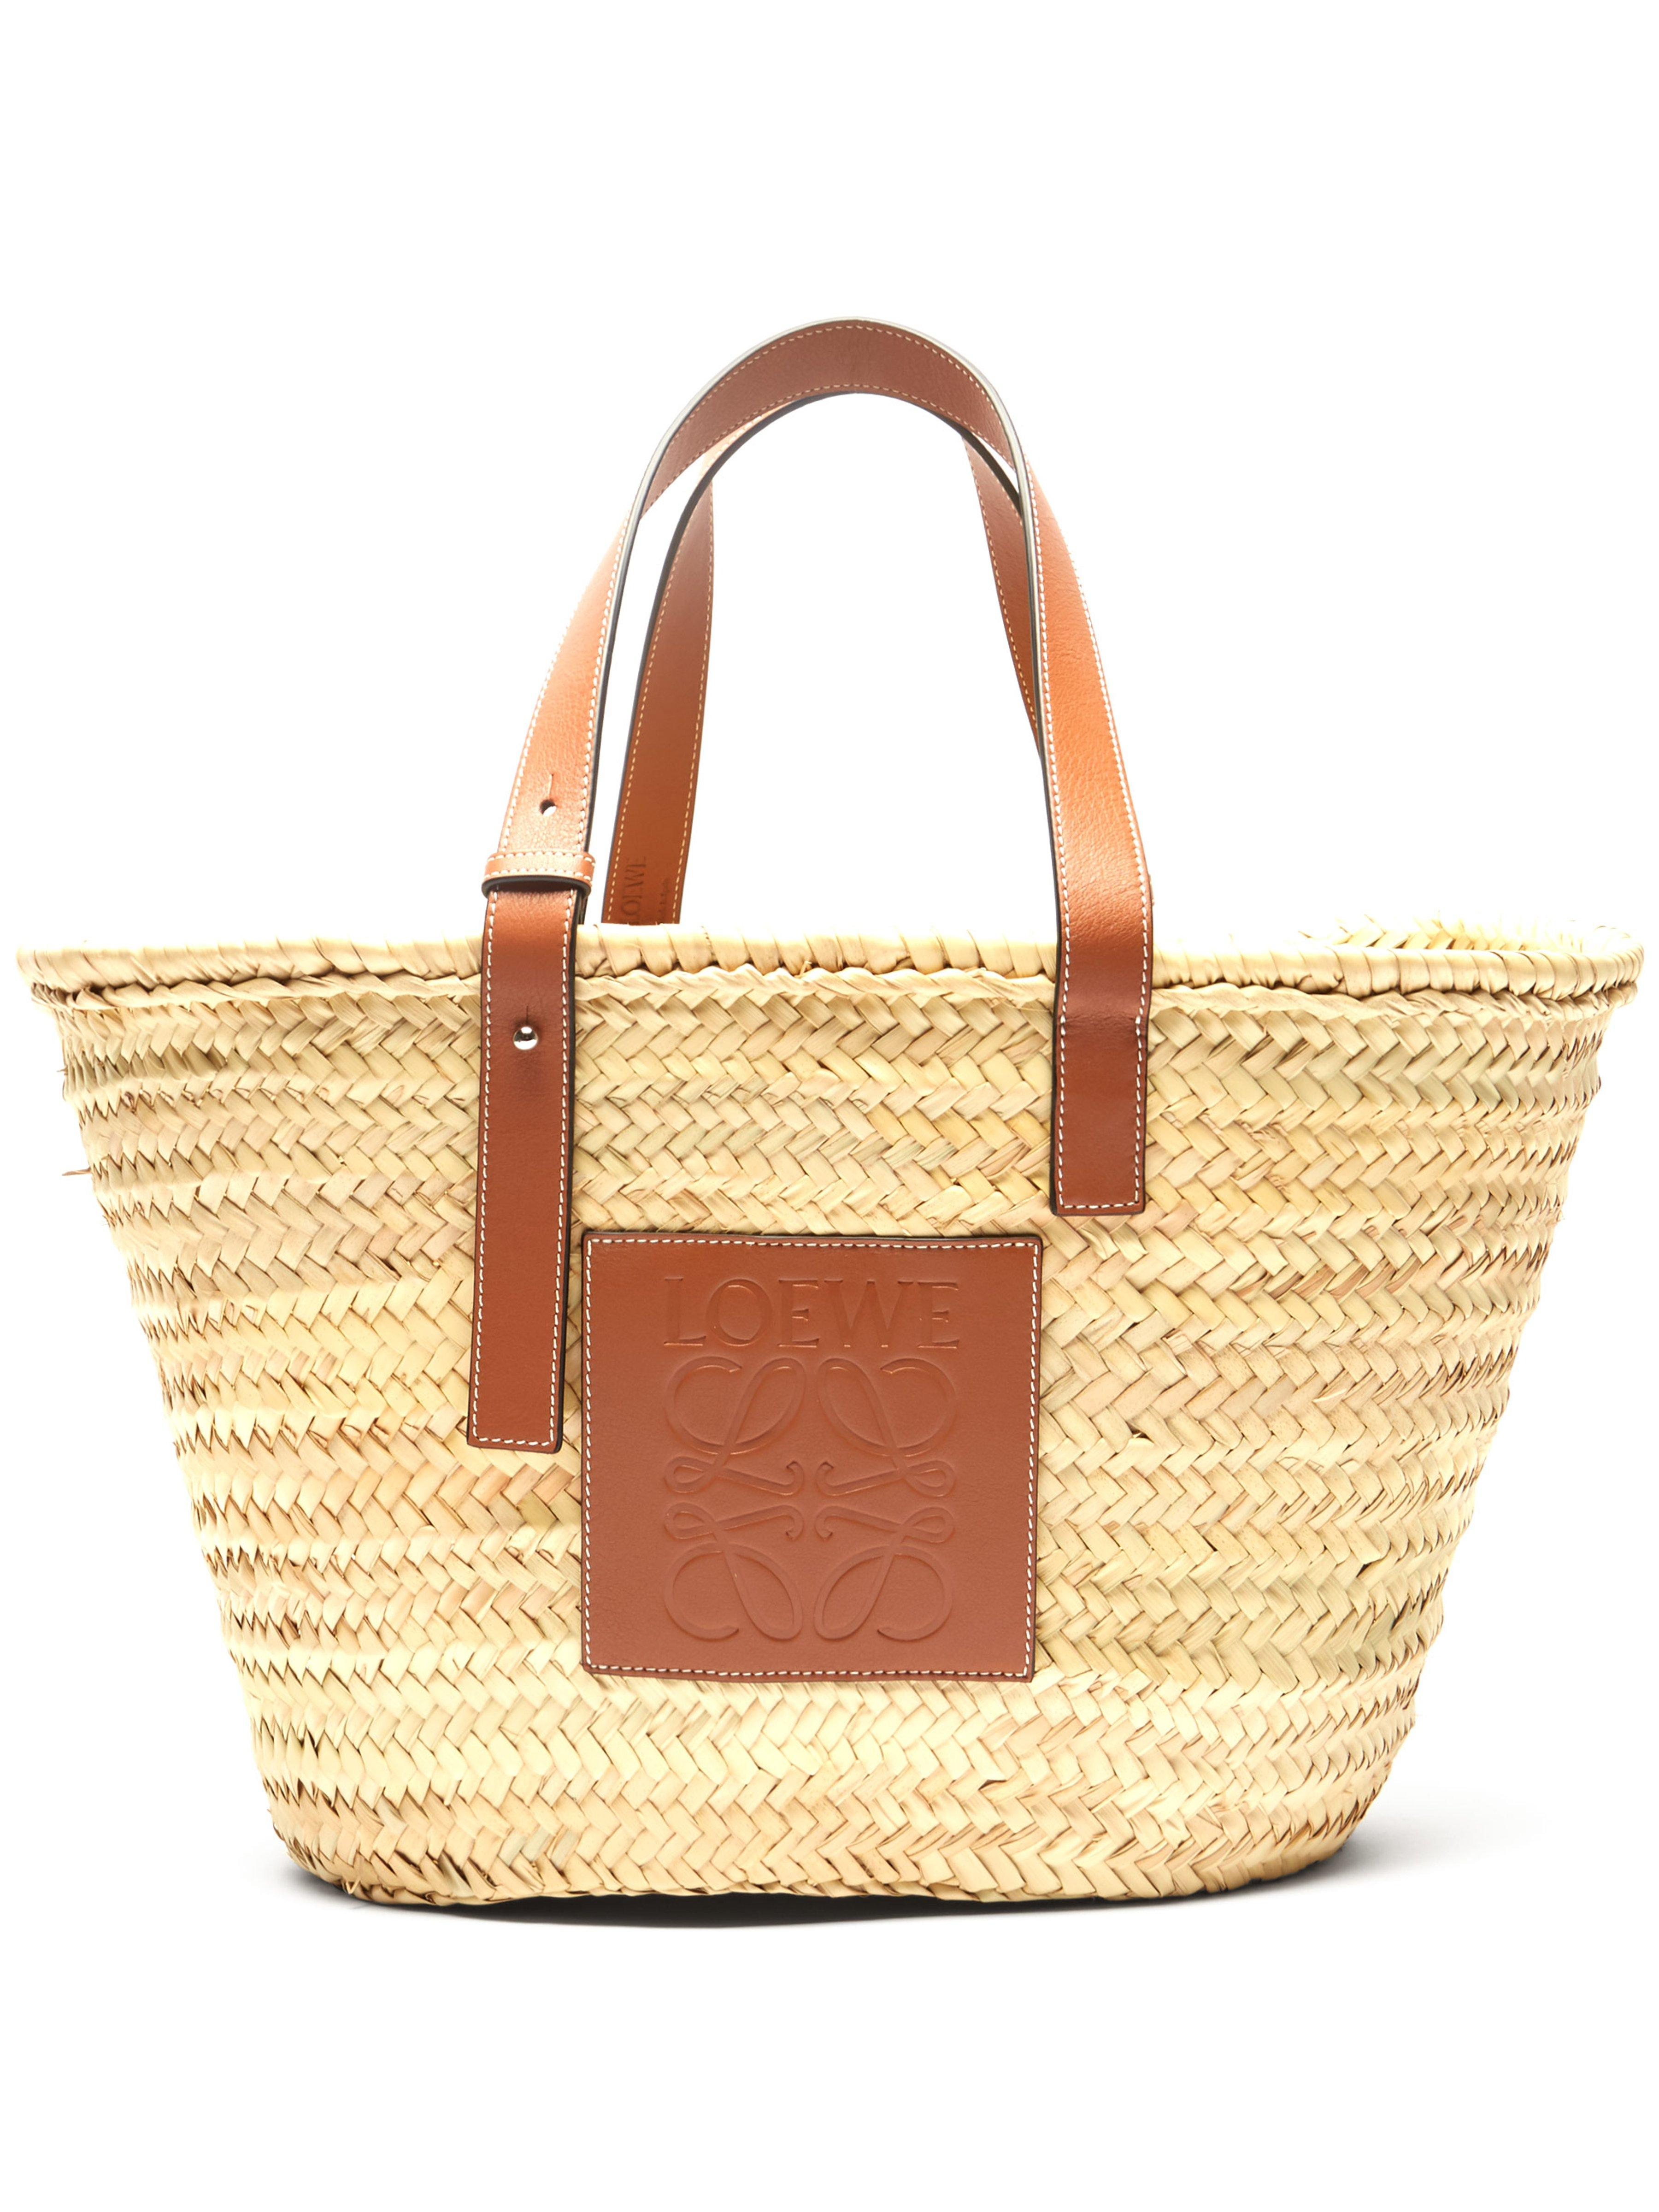 Loewe Medium Woven Basket Bag in Natural for Men - Lyst 2c03d7e14eb1f